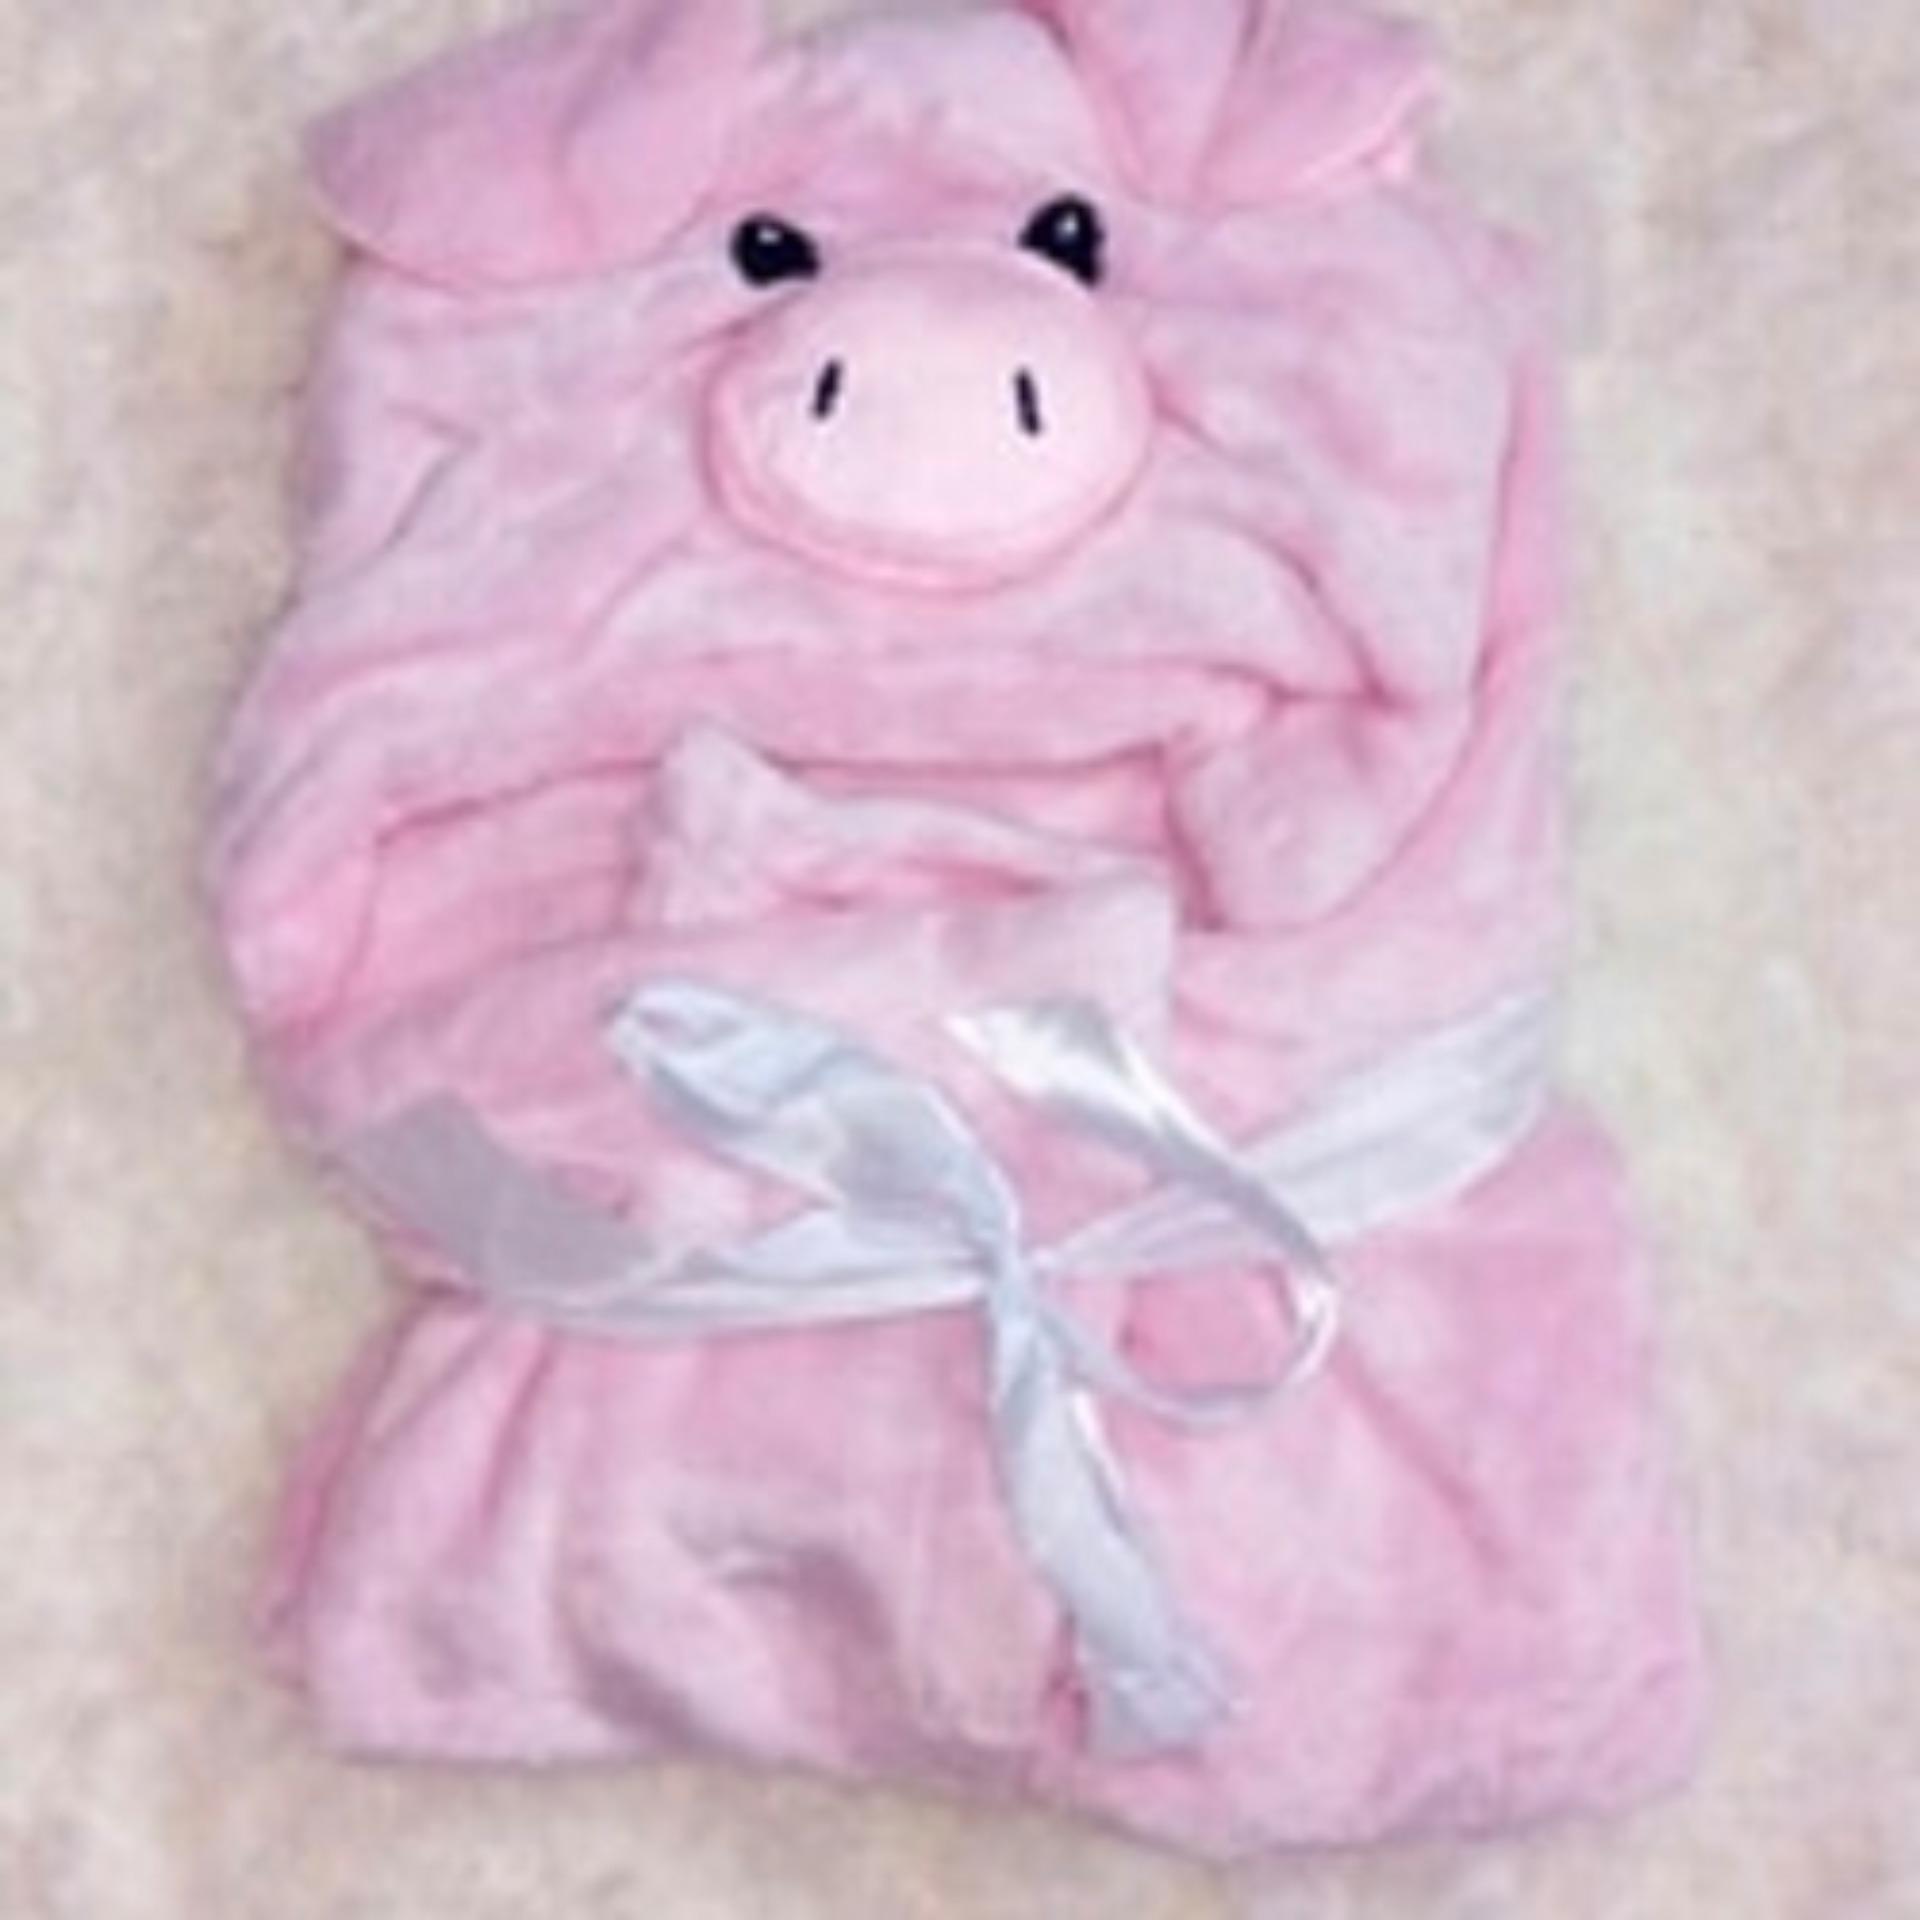 Pencarian Termurah MomBaby Selimut Topi Double Fleece Hoodie 3D Blanket Tudung Animal